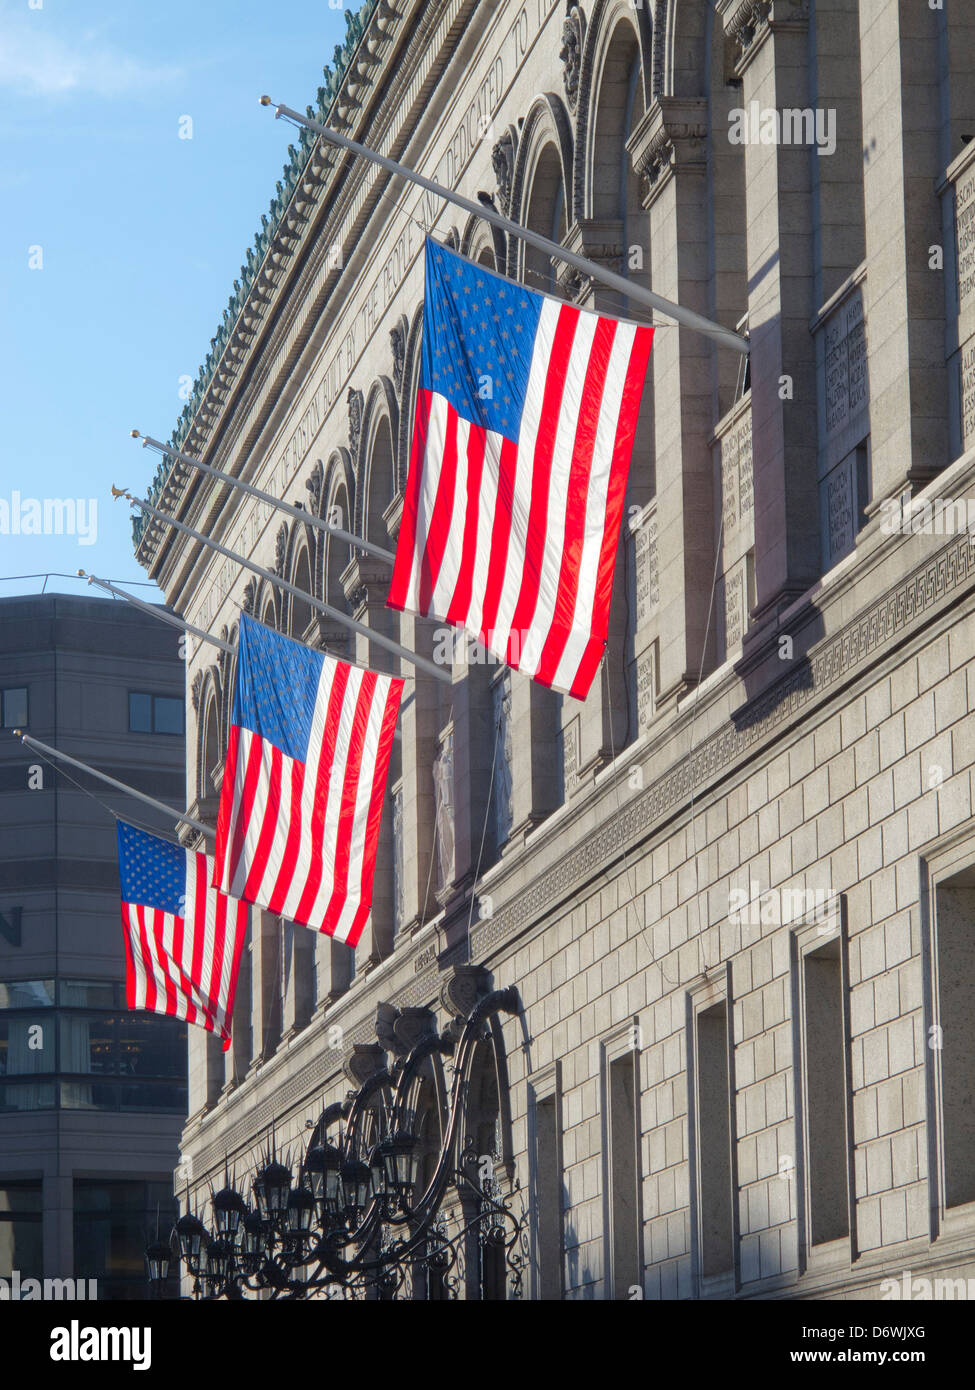 American flags dangle in the sun from the Boston Public Library, Copley Square, Boston, Massachusetts, USA - Stock Image